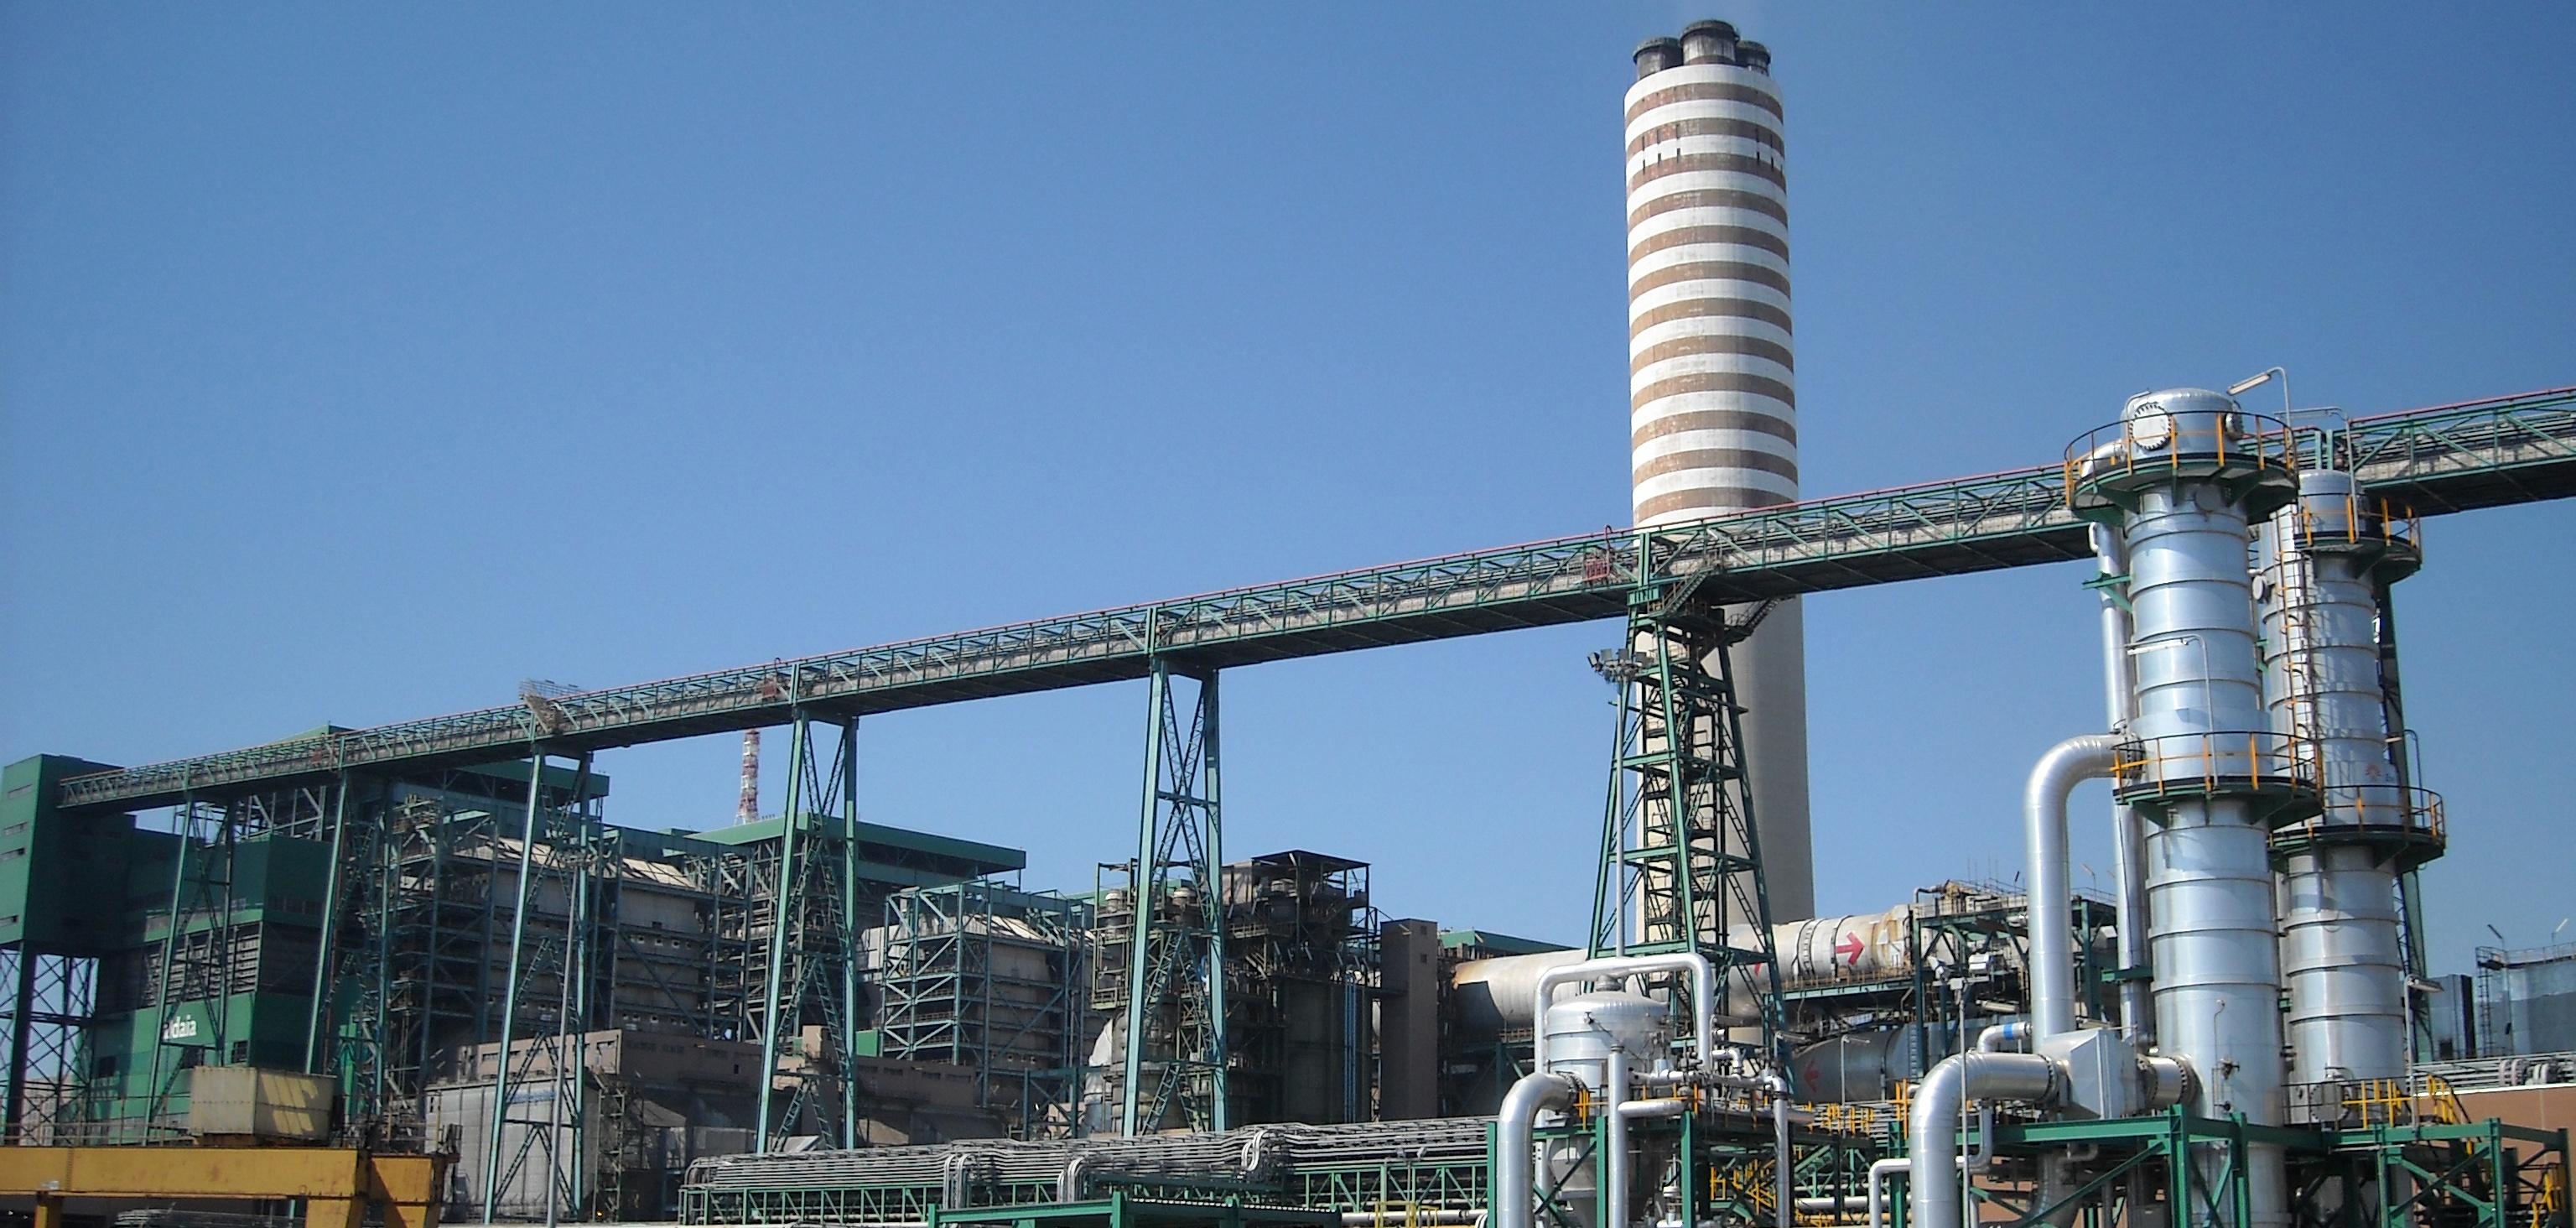 ELEL Italy Power Plant FGD ZLD Photo 1